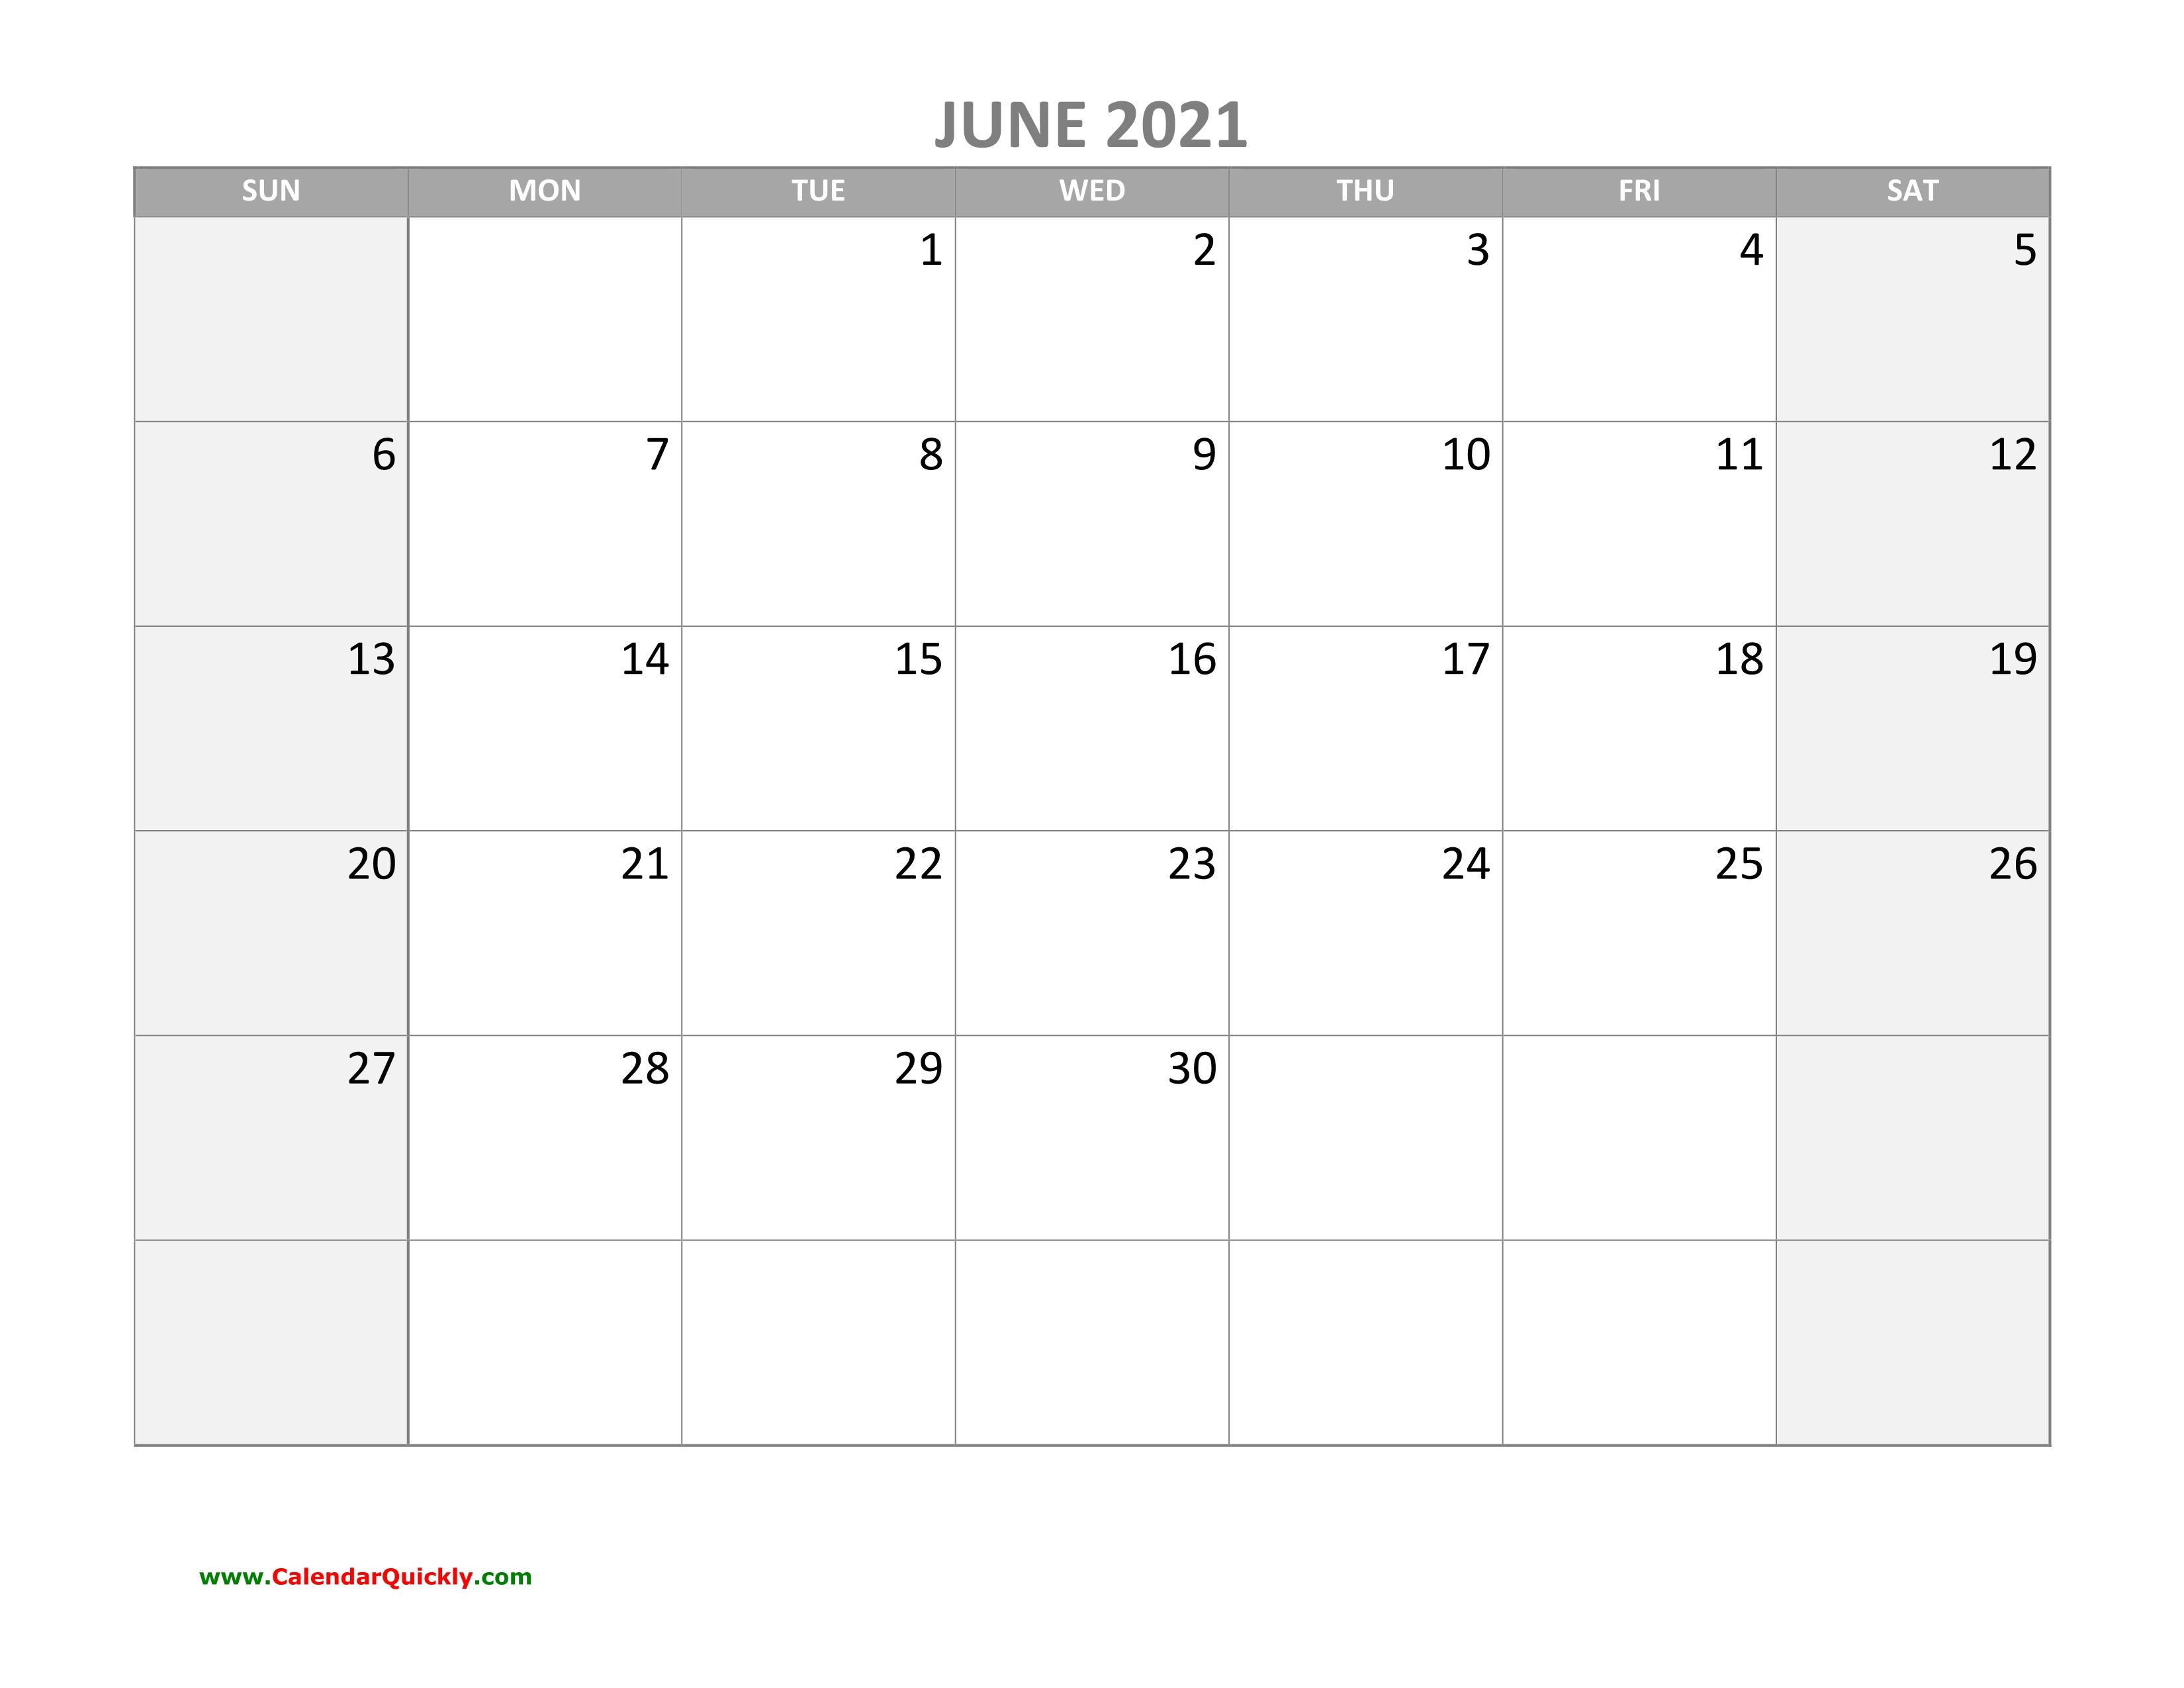 June Calendar 2021 With Holidays | Calendar Quickly June 2021 Calendar With Holidays Usa